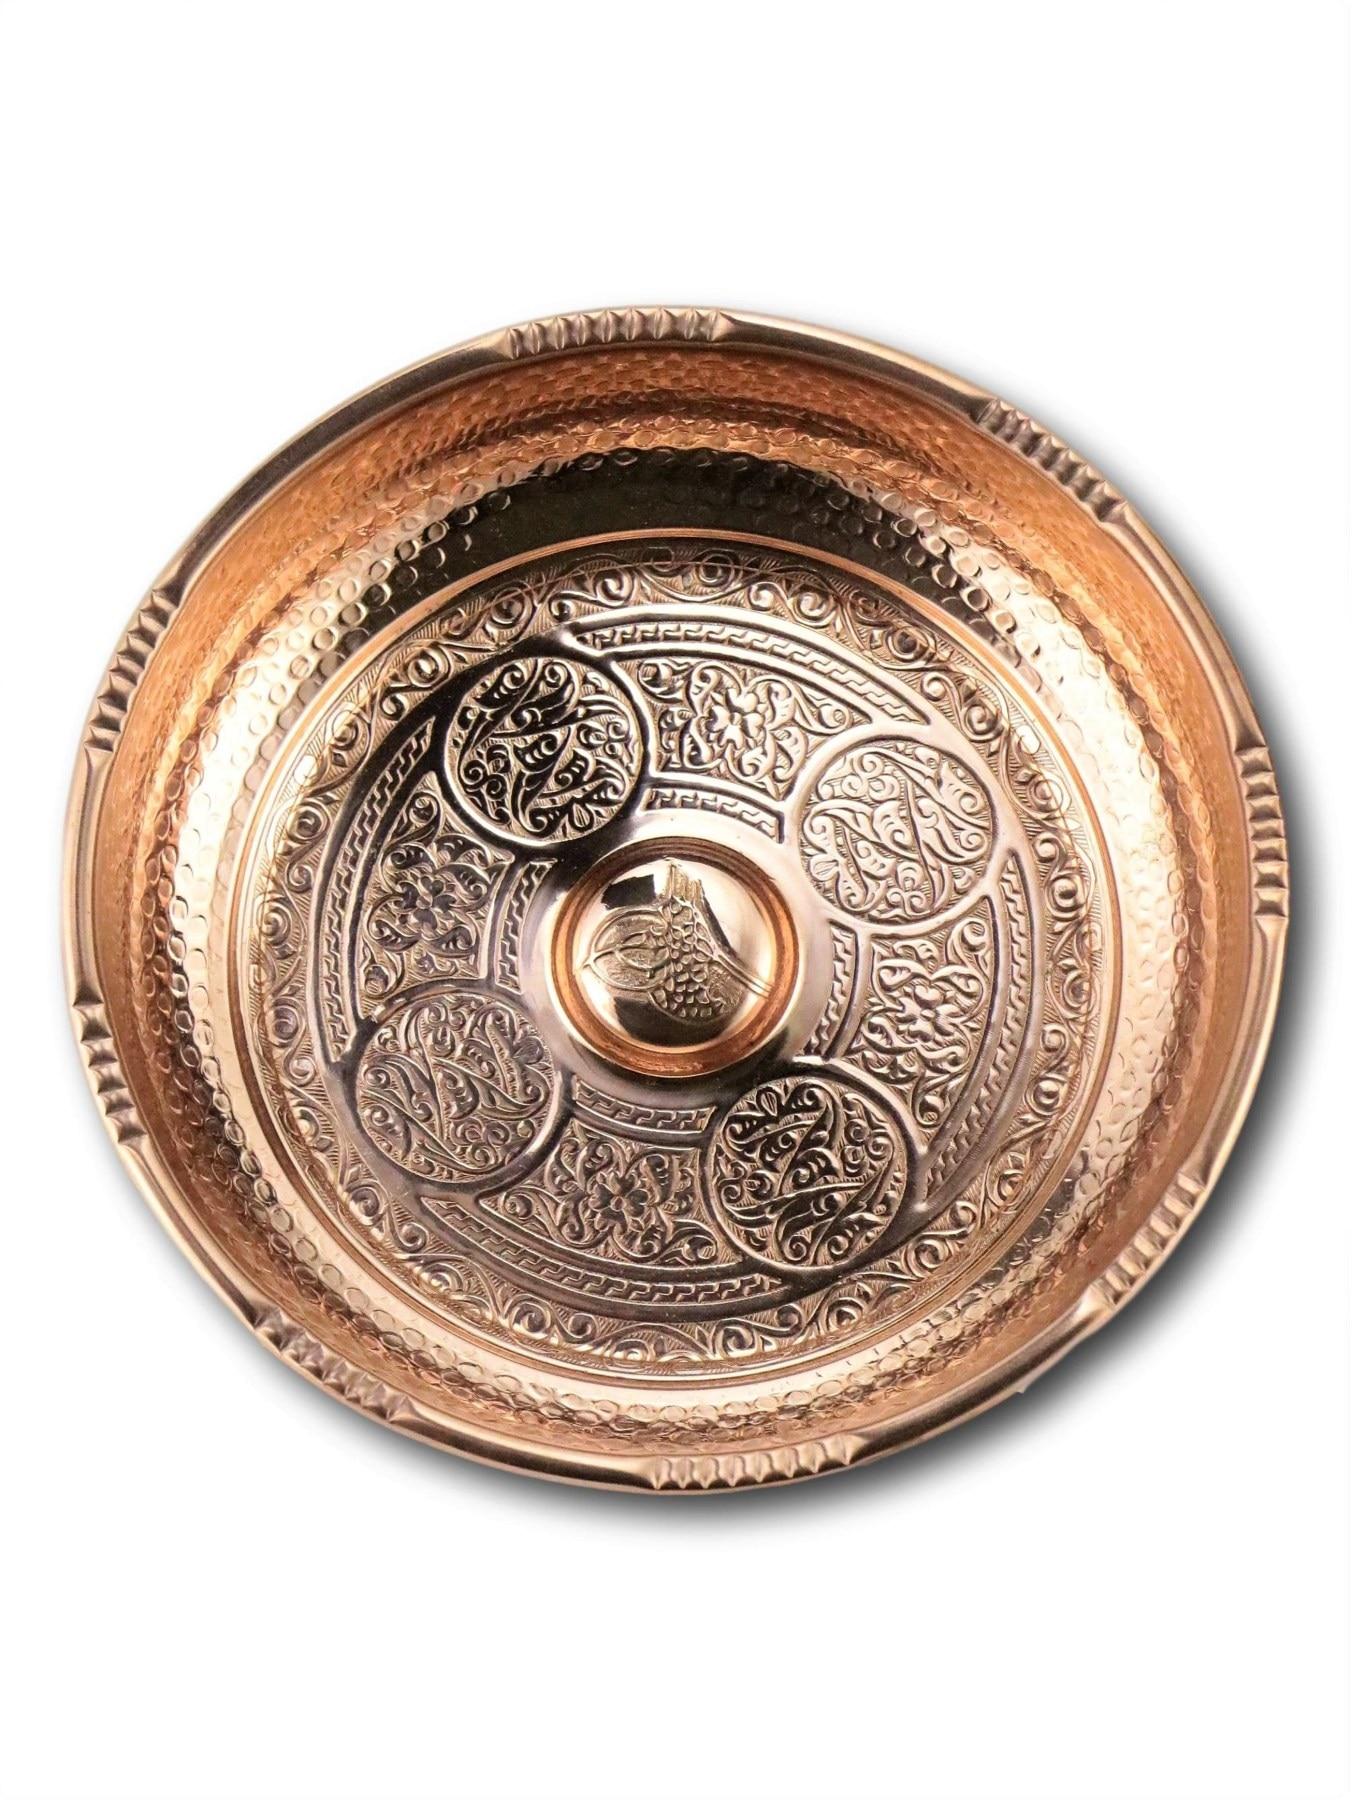 Morya Copper Turkish 2baths Bowl Luxory Bathroom Accessories Elegant Decorative Hammared Handmade Decor Vintage 18 cm